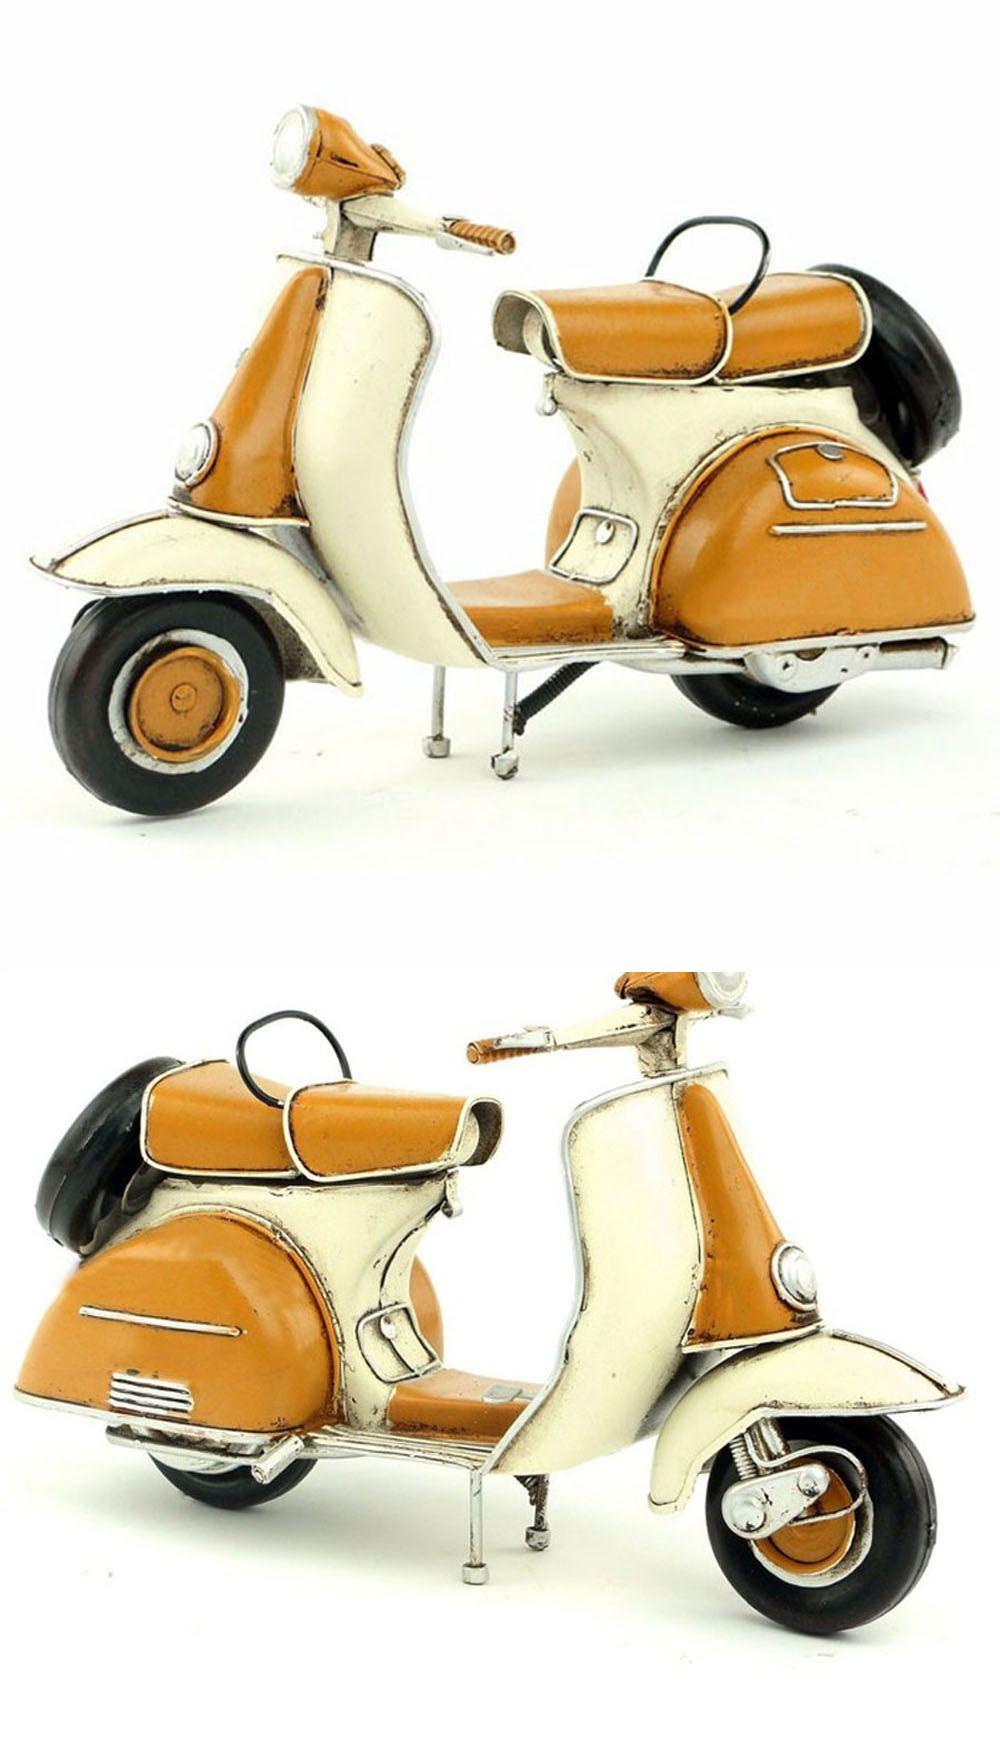 Handmade Antique Tin Model Motorbike Yellow Vespa Scooter 1965